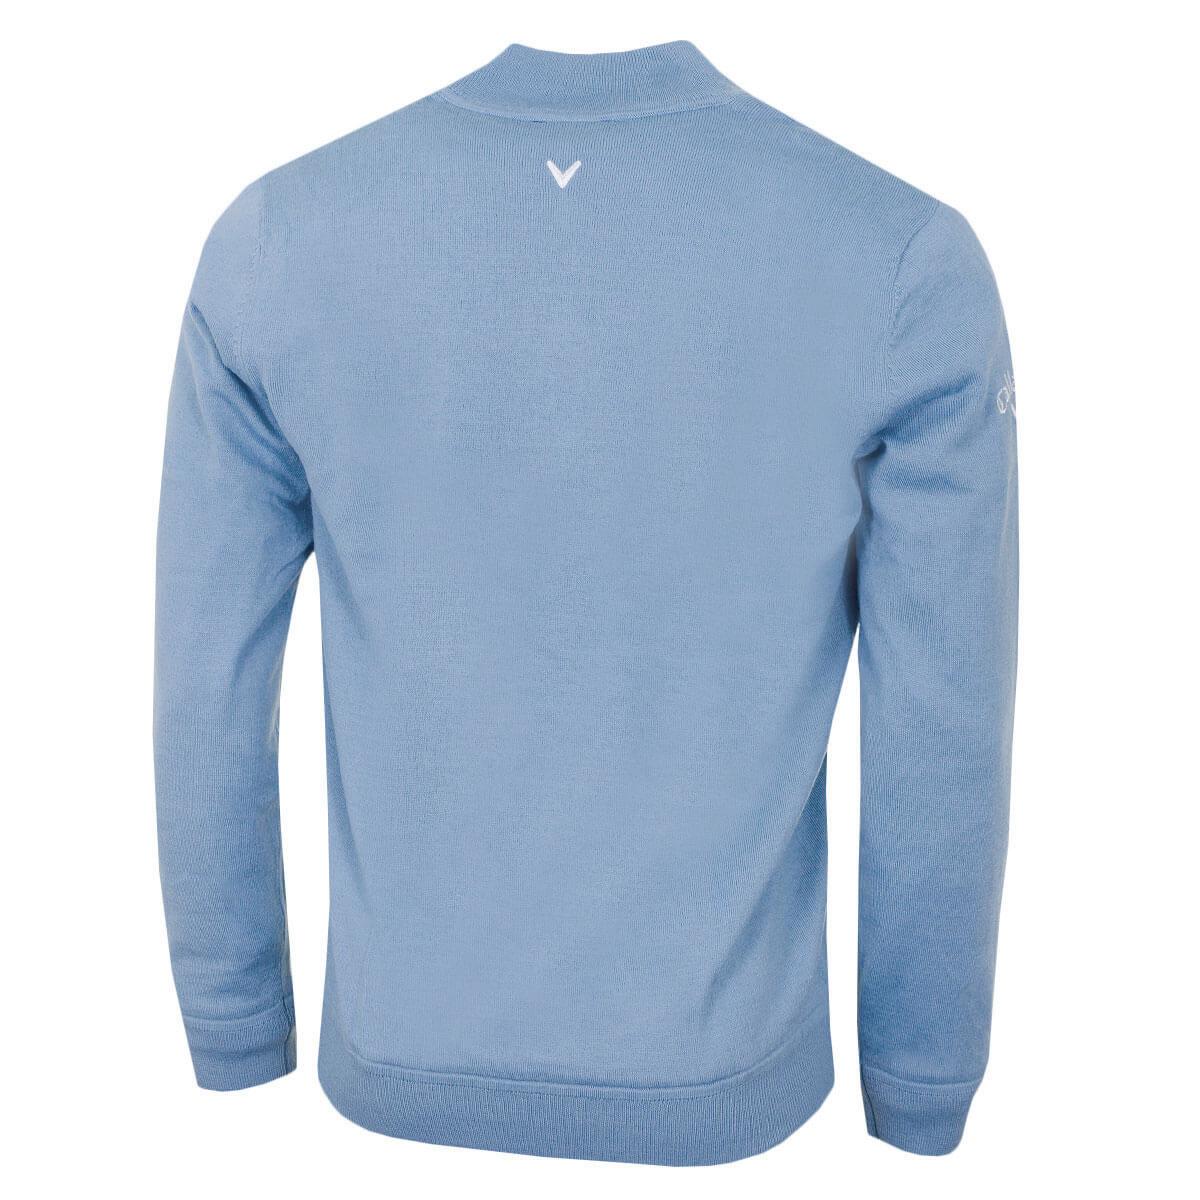 Callaway-Golf-Mens-1-4-Zip-Mock-Merino-Windproof-Sweater-Pullover-43-OFF-RRP thumbnail 15